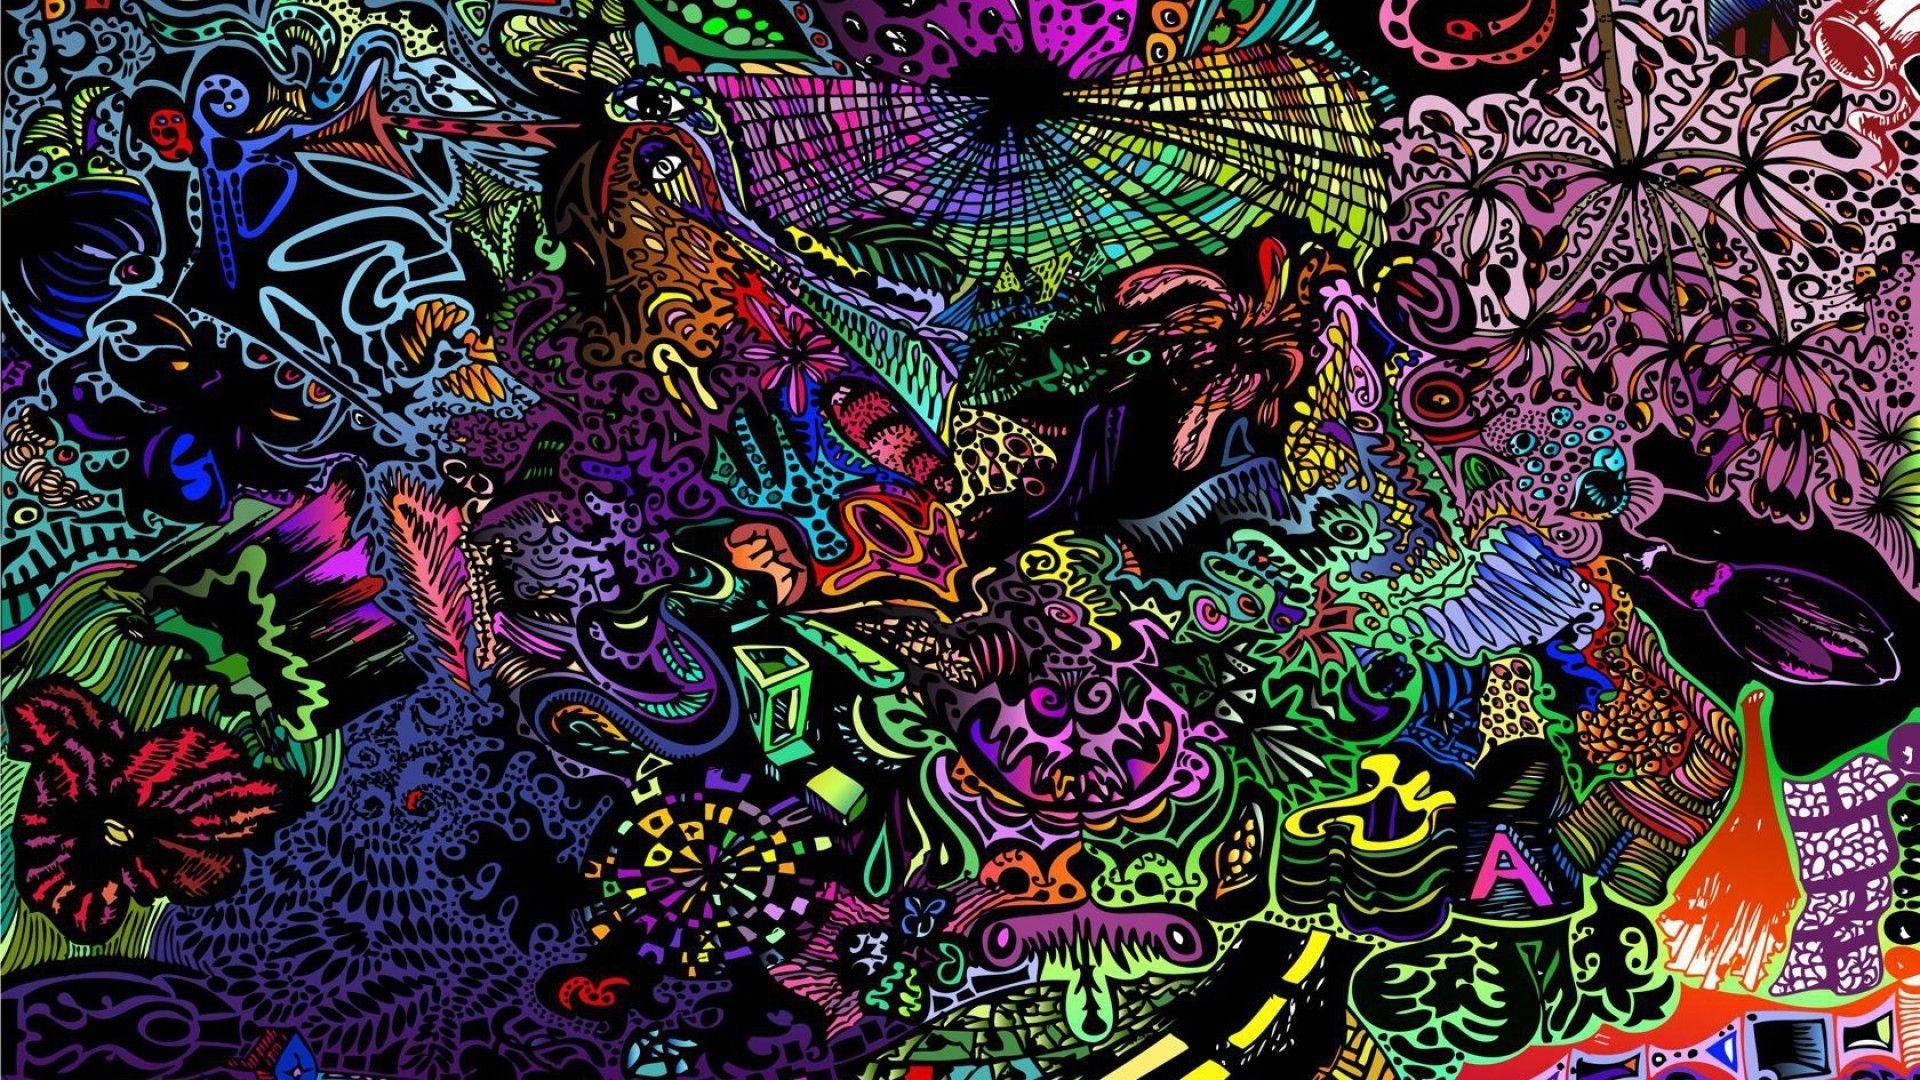 Trippy Colorful Desktop Wallpaper Best Hd Wallpapers Trippy Iphone Wallpaper Hippie Wallpaper Trippy Backgrounds